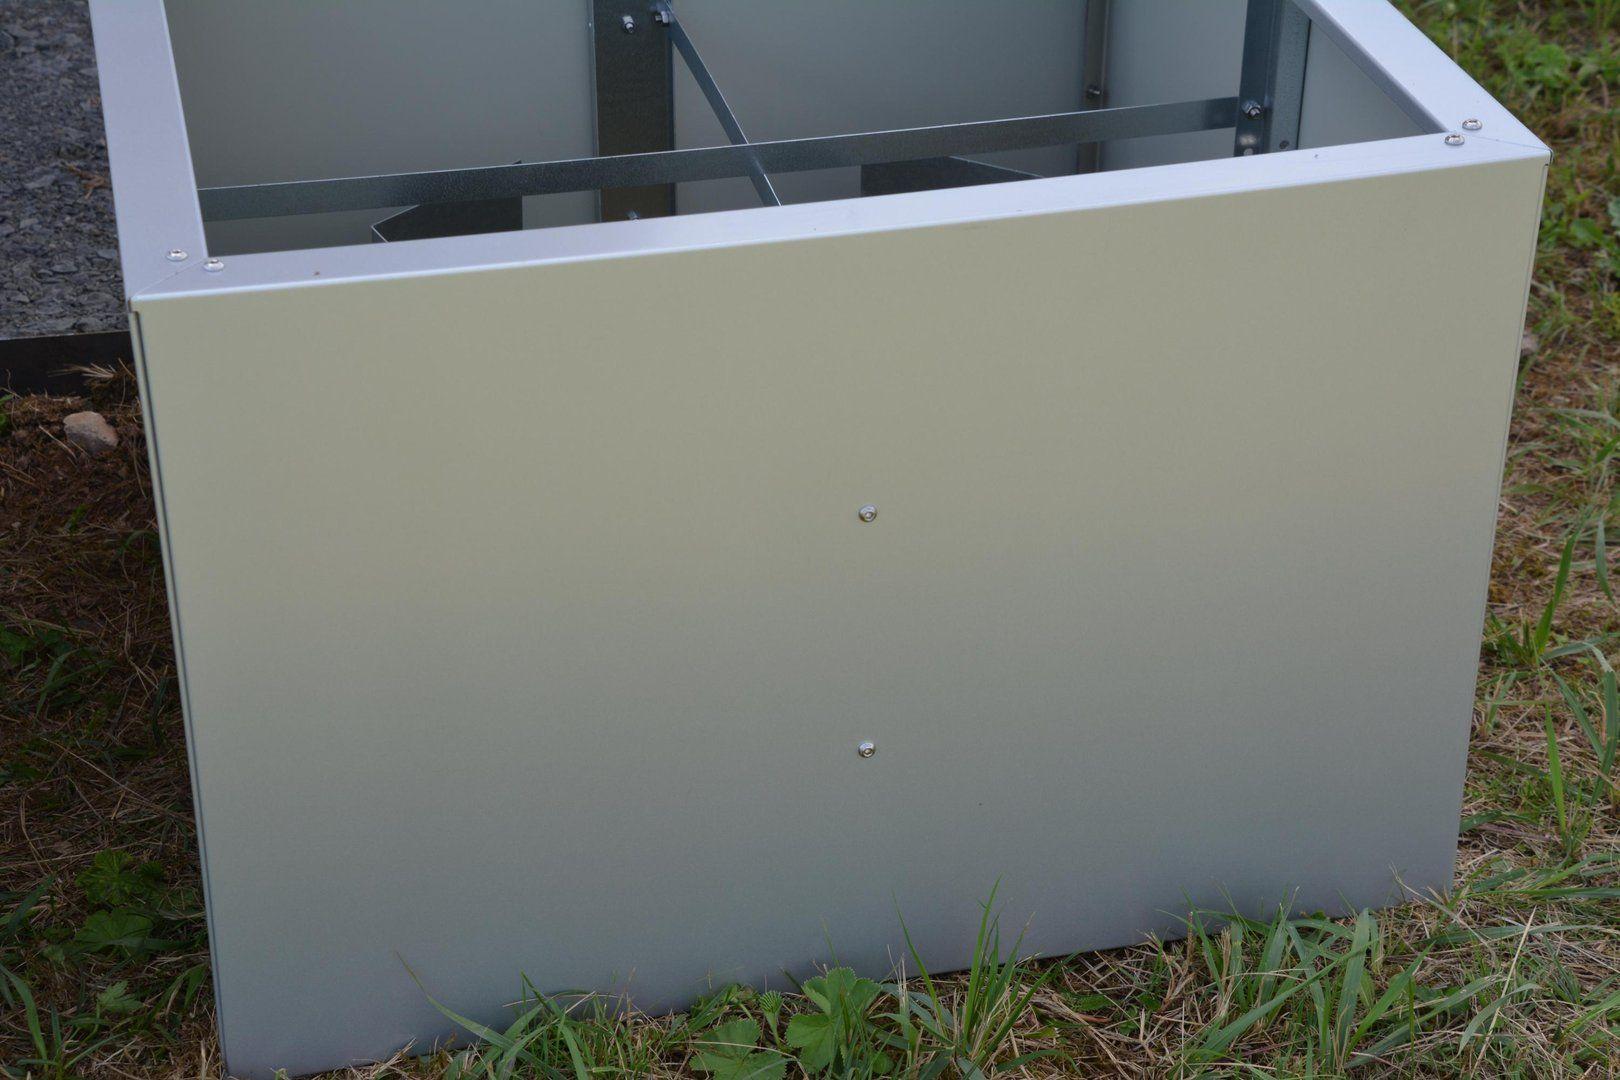 Hochbeet Urban Metall 0 55 X 0 75 M Hohe 0 5 M Lackiert In 2020 Hochbeet Gartenboden Innenhof